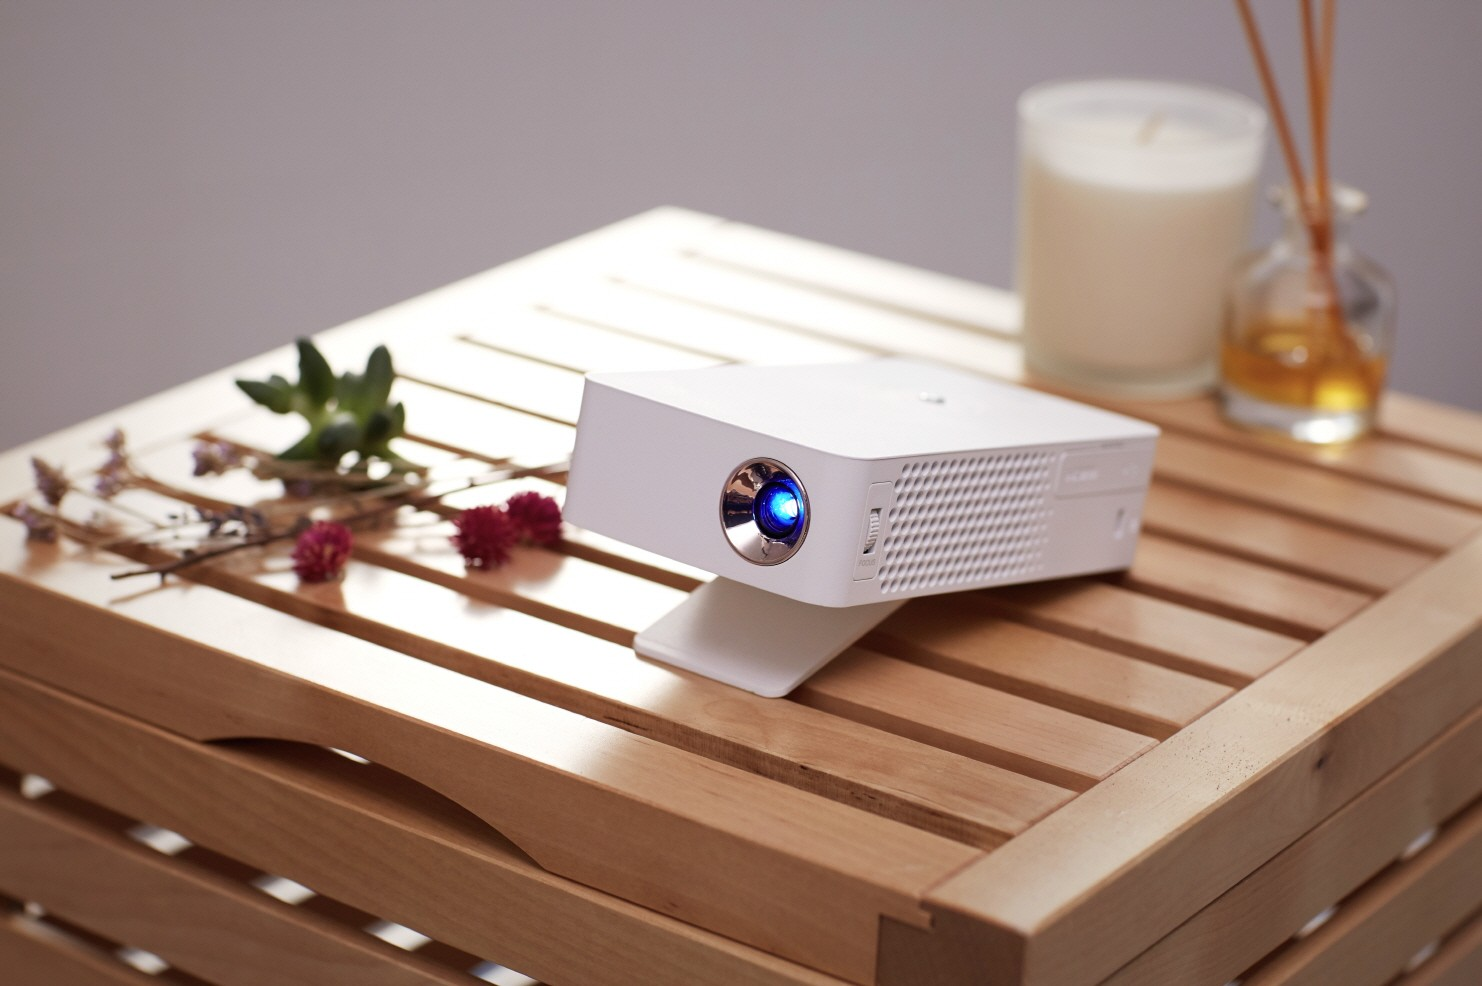 LG MiniBeam home cinema projector